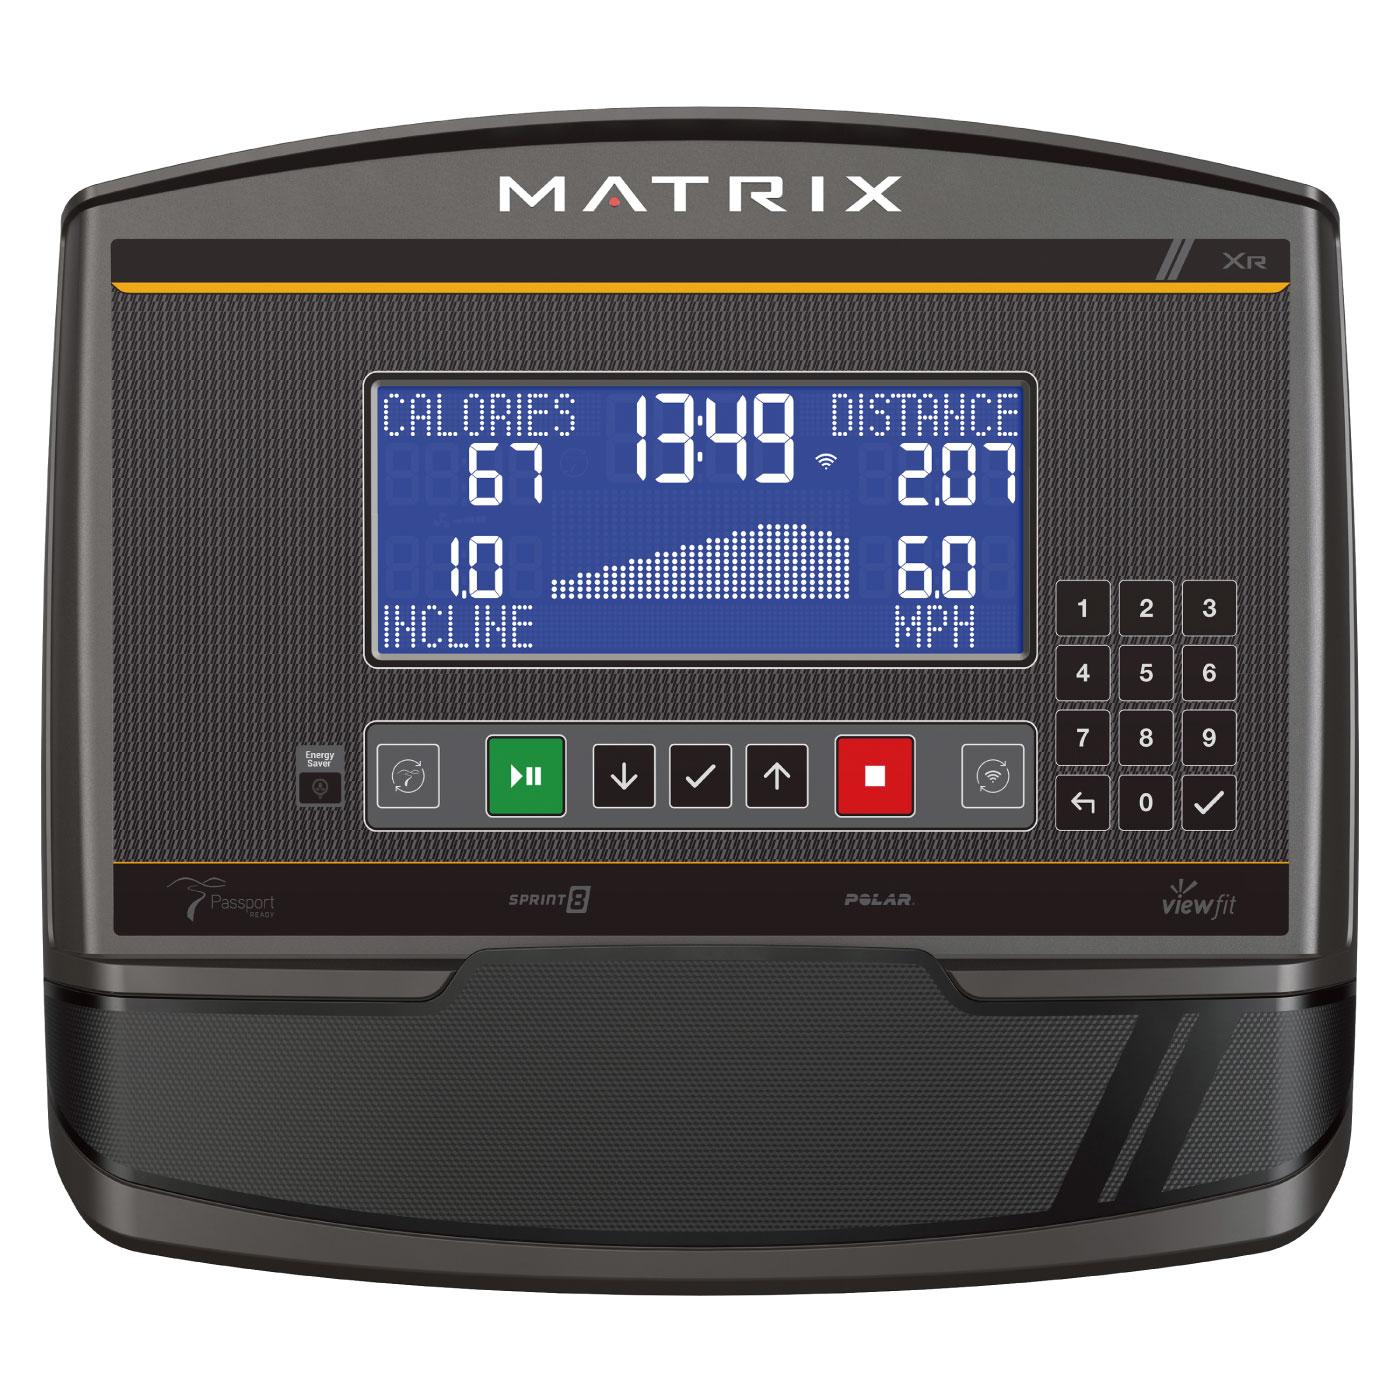 E50-XR/家庭用クロストレーナー〈家庭用MATRIX〉《ジョンソンヘルステック》